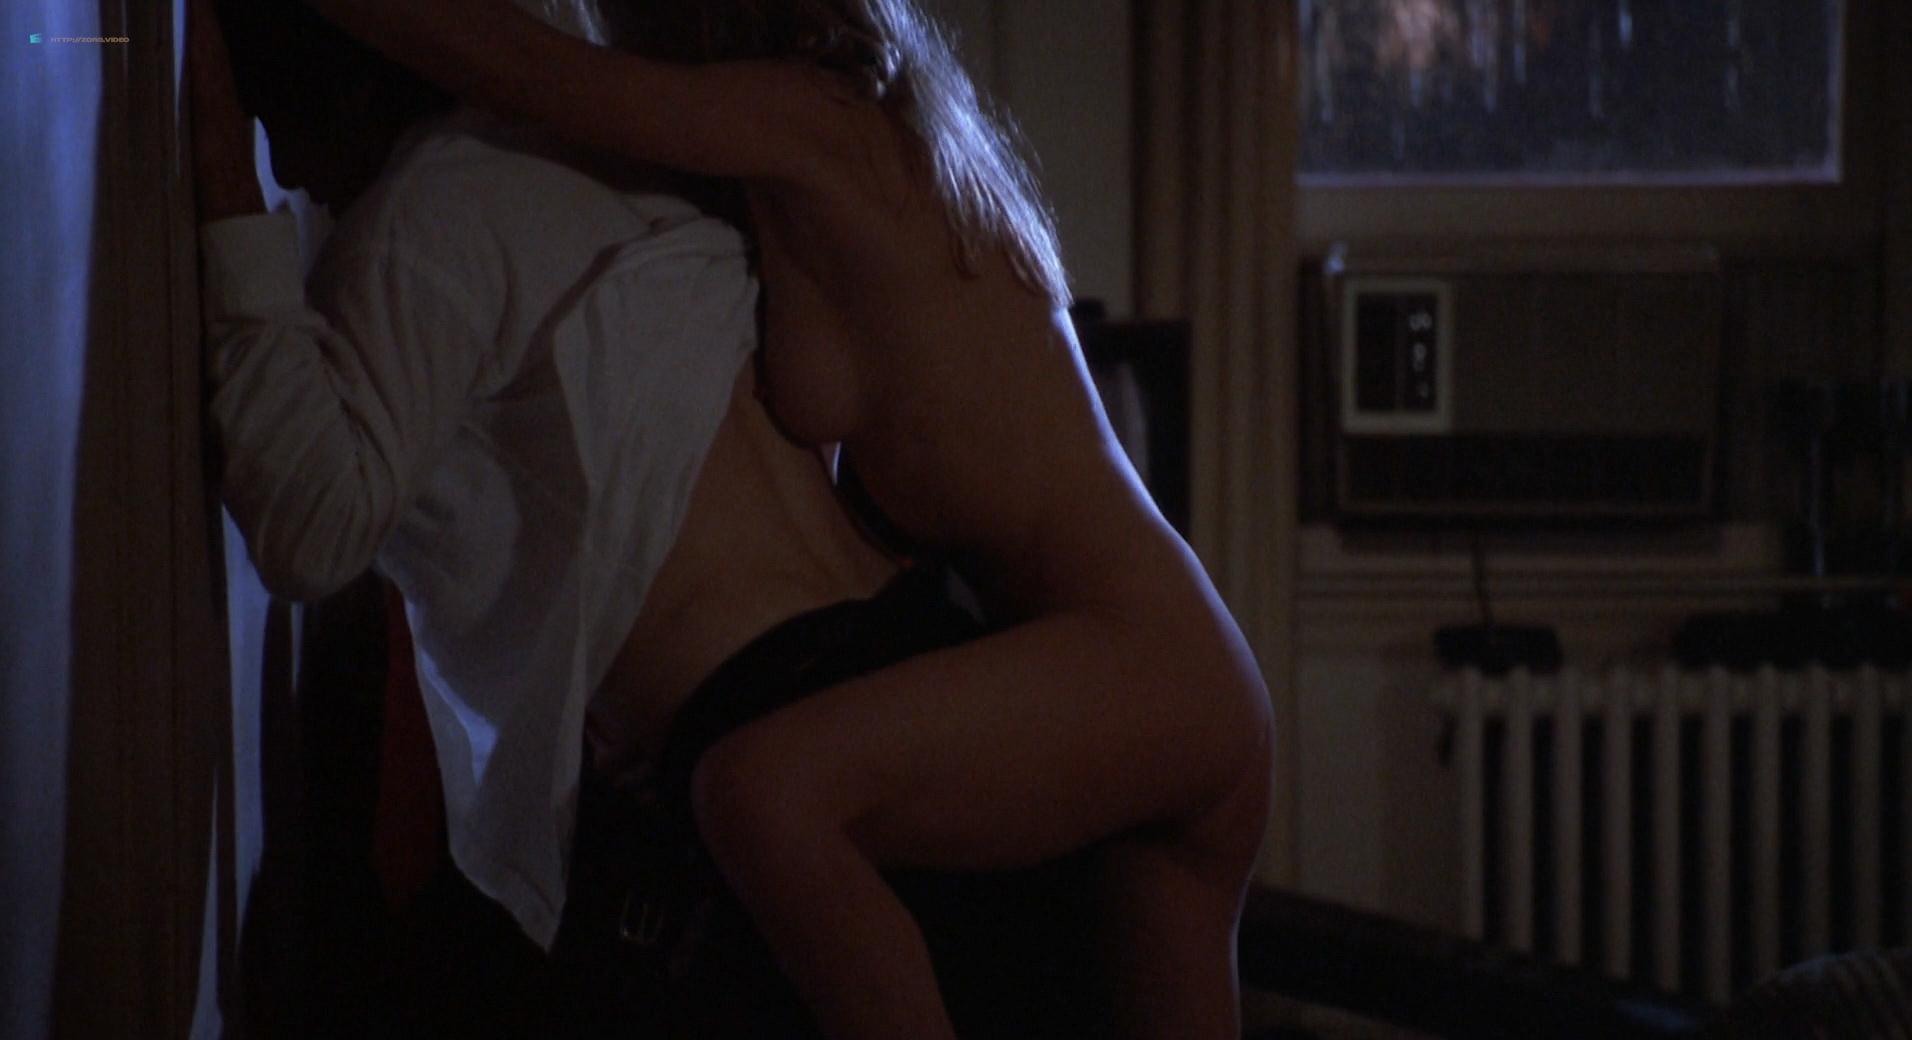 Ellen Barkin nude boobs and butt - Sea of Love (1989) HD 1080p BluRay (1)